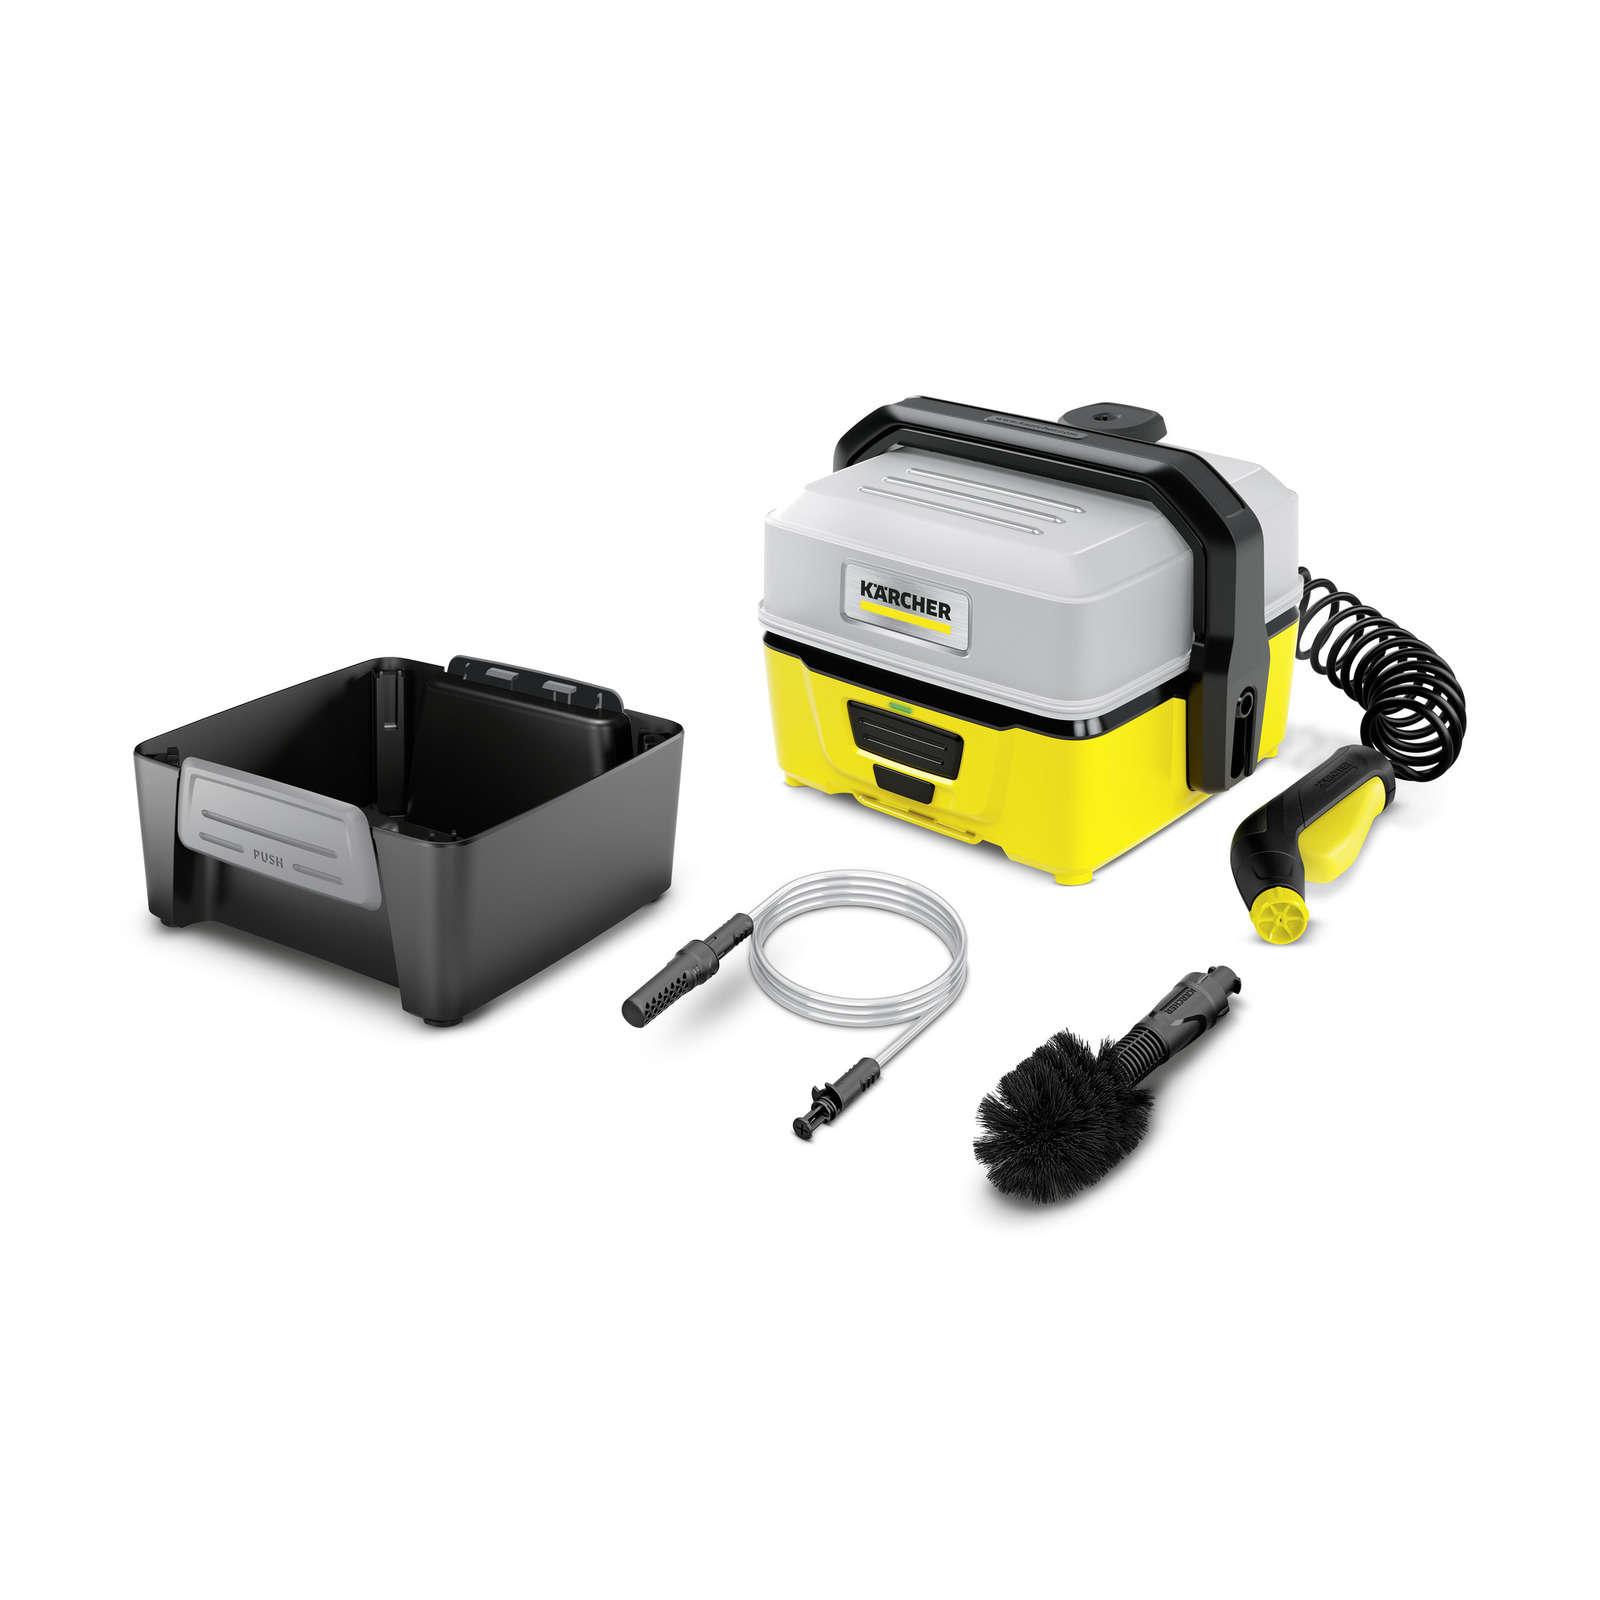 Kärcher Mobile Outdoor Cleaner OC 3 + Adventure Box